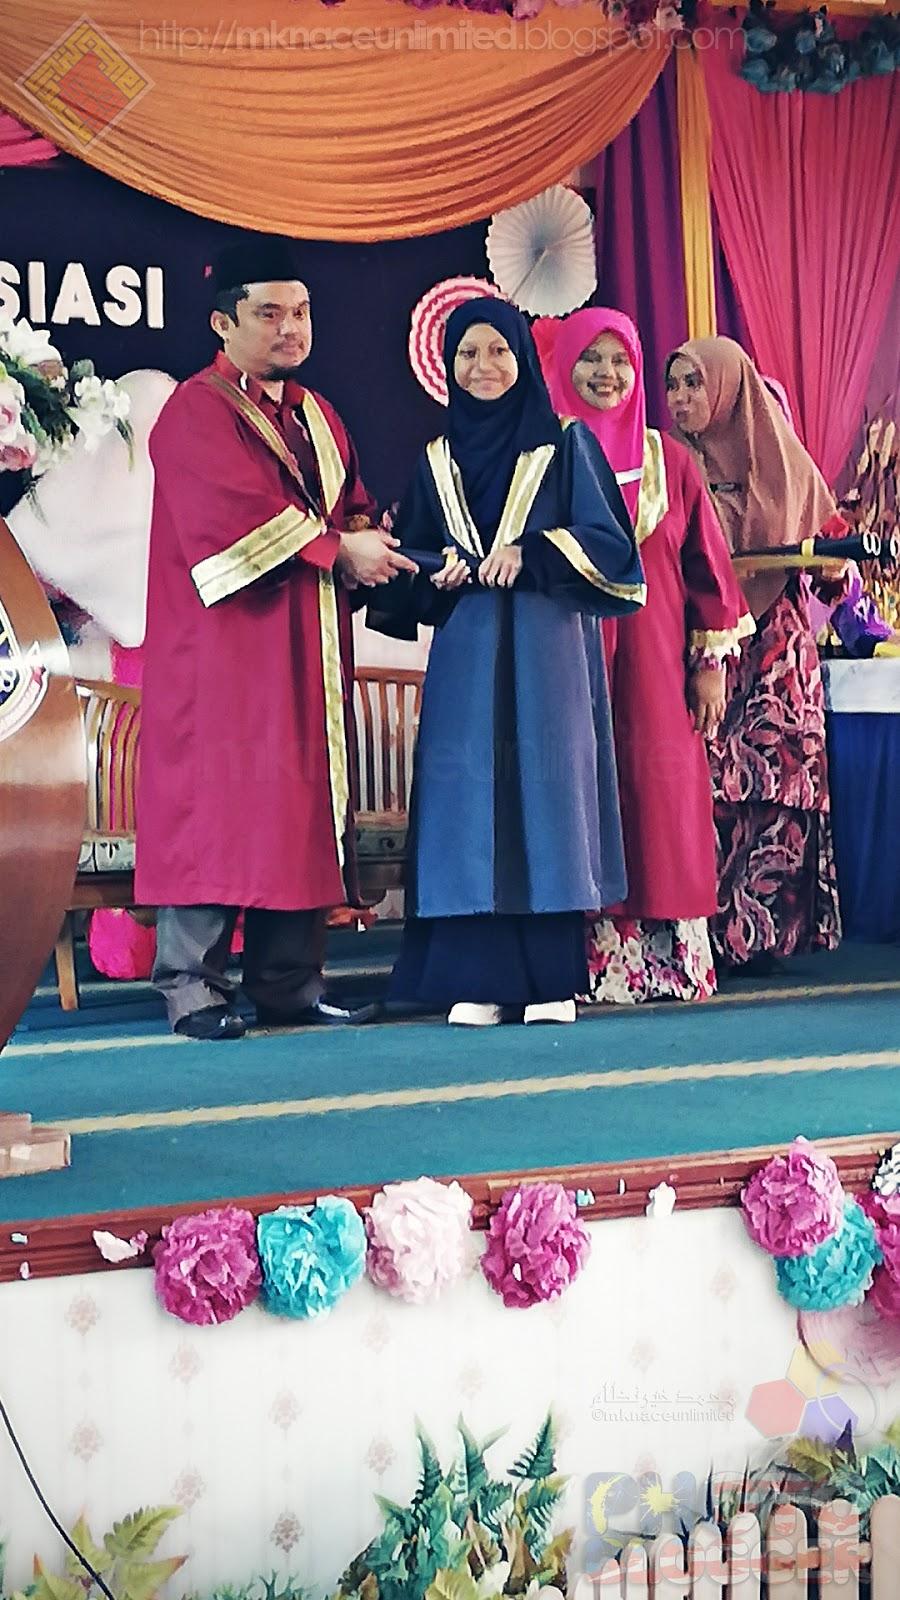 Sekolah Agama Nusa Perintis Majlis Apresiasi Murid Darjah Enam Tcash Vaganza 32 Milo Malaysia Activ Go Bersama Mama